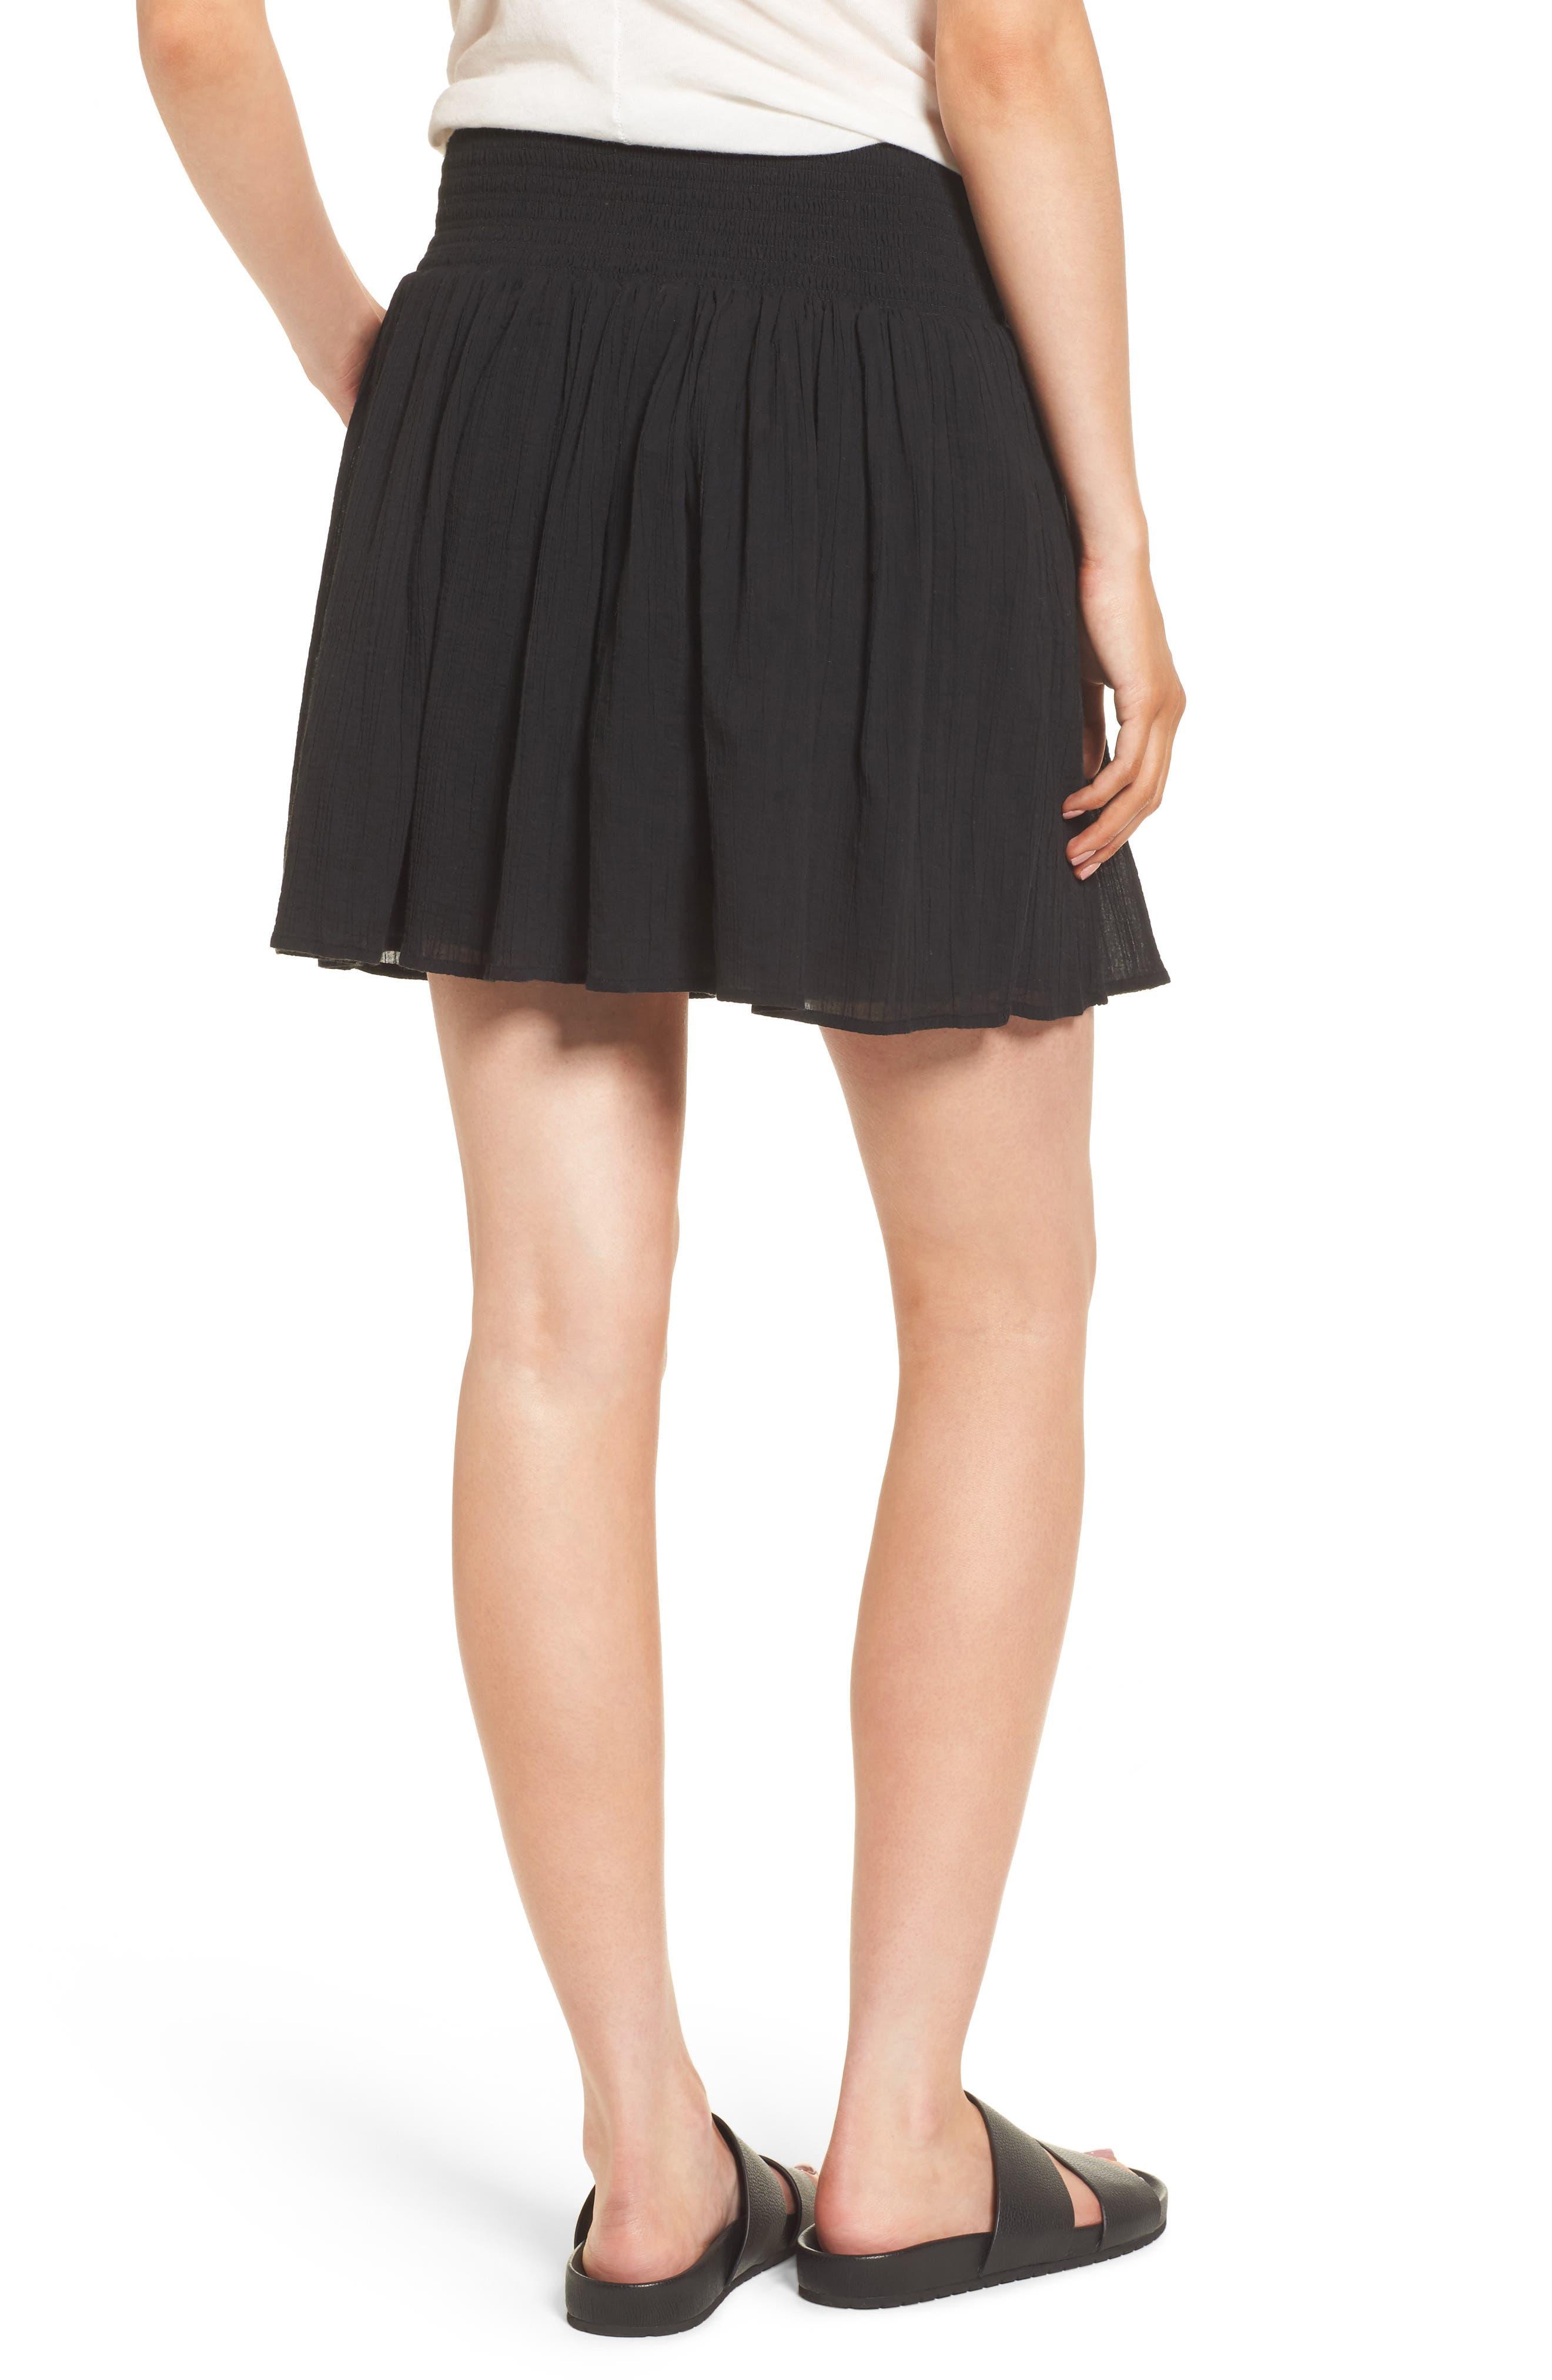 Alternate Image 2  - James Perse Smocked Cotton Skirt